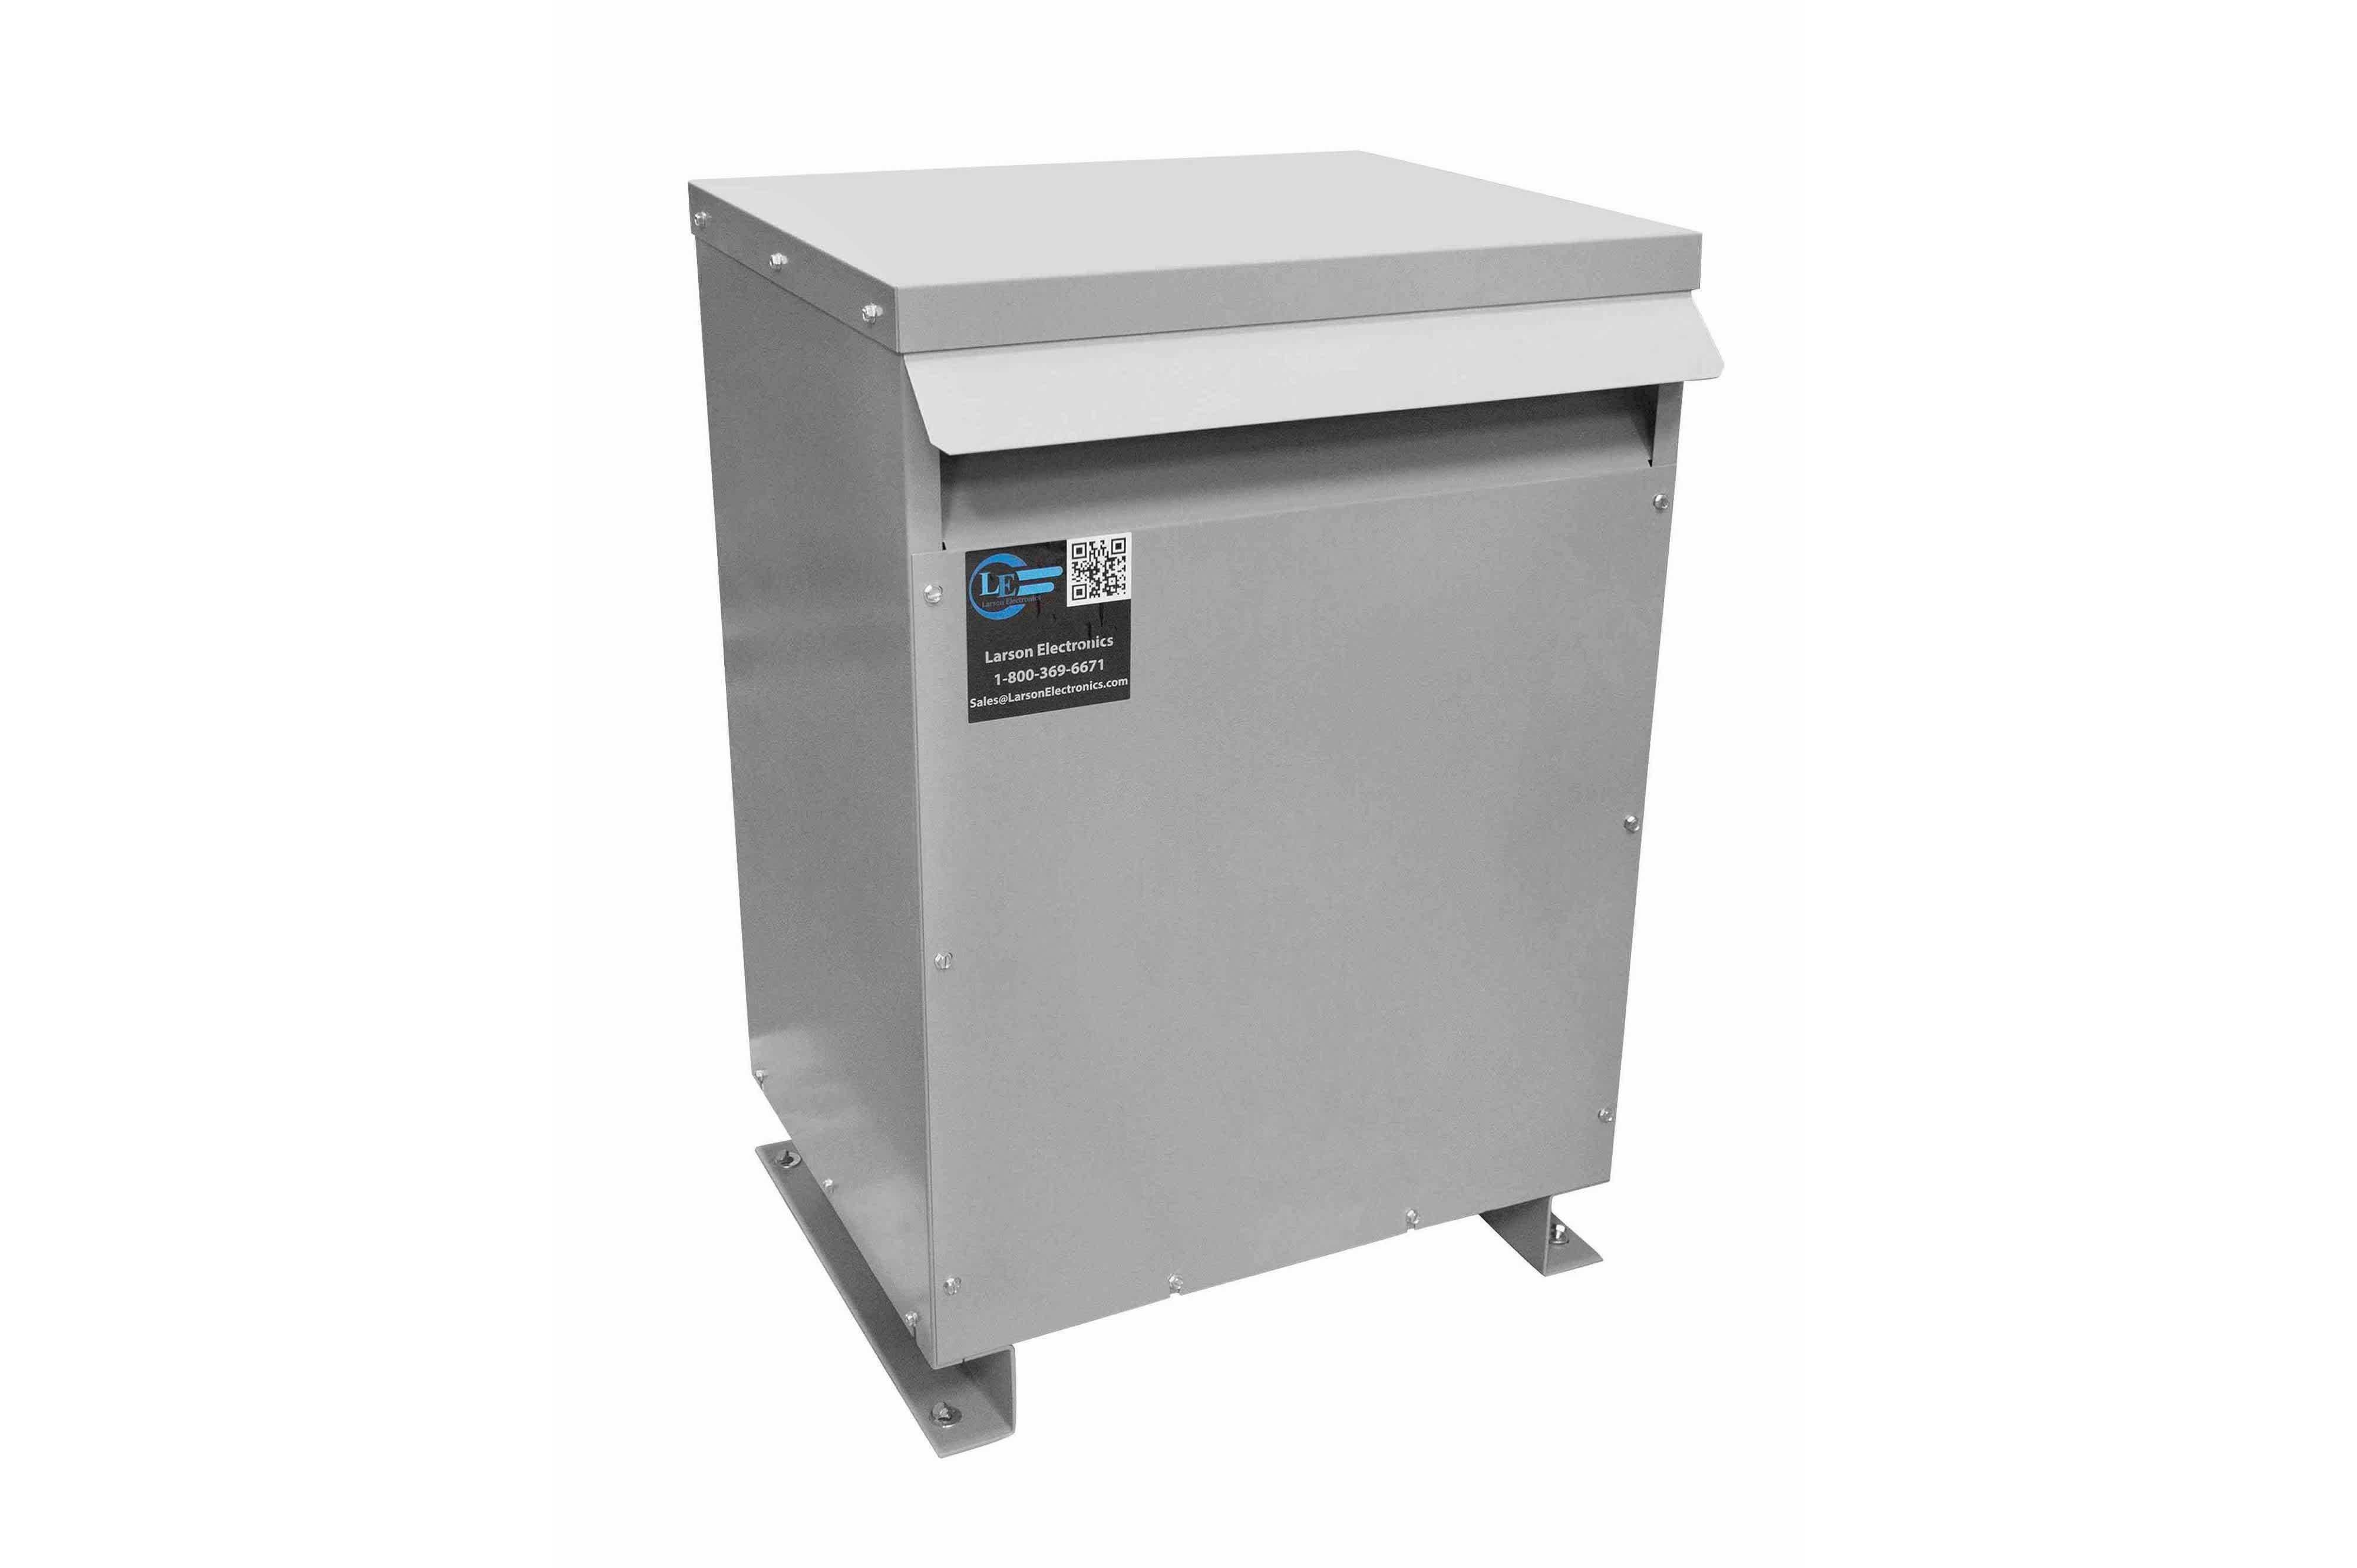 55 kVA 3PH Isolation Transformer, 460V Wye Primary, 380Y/220 Wye-N Secondary, N3R, Ventilated, 60 Hz